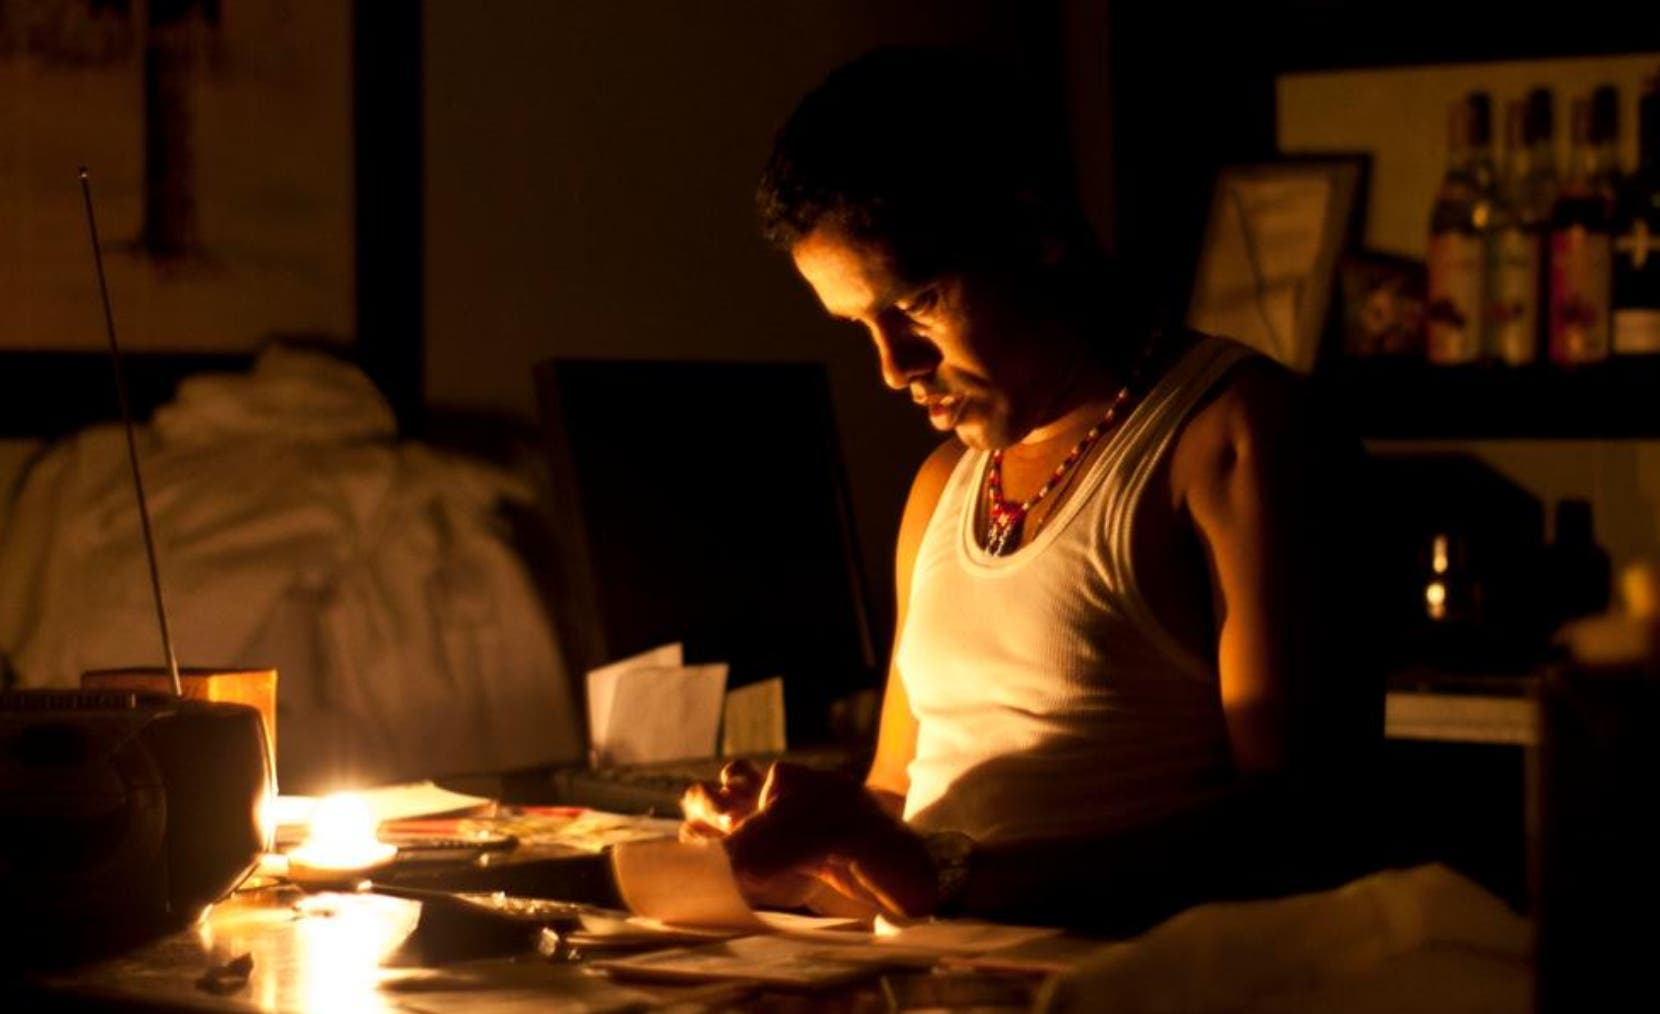 Crisis energética se refleja en apagones que afectan comercio